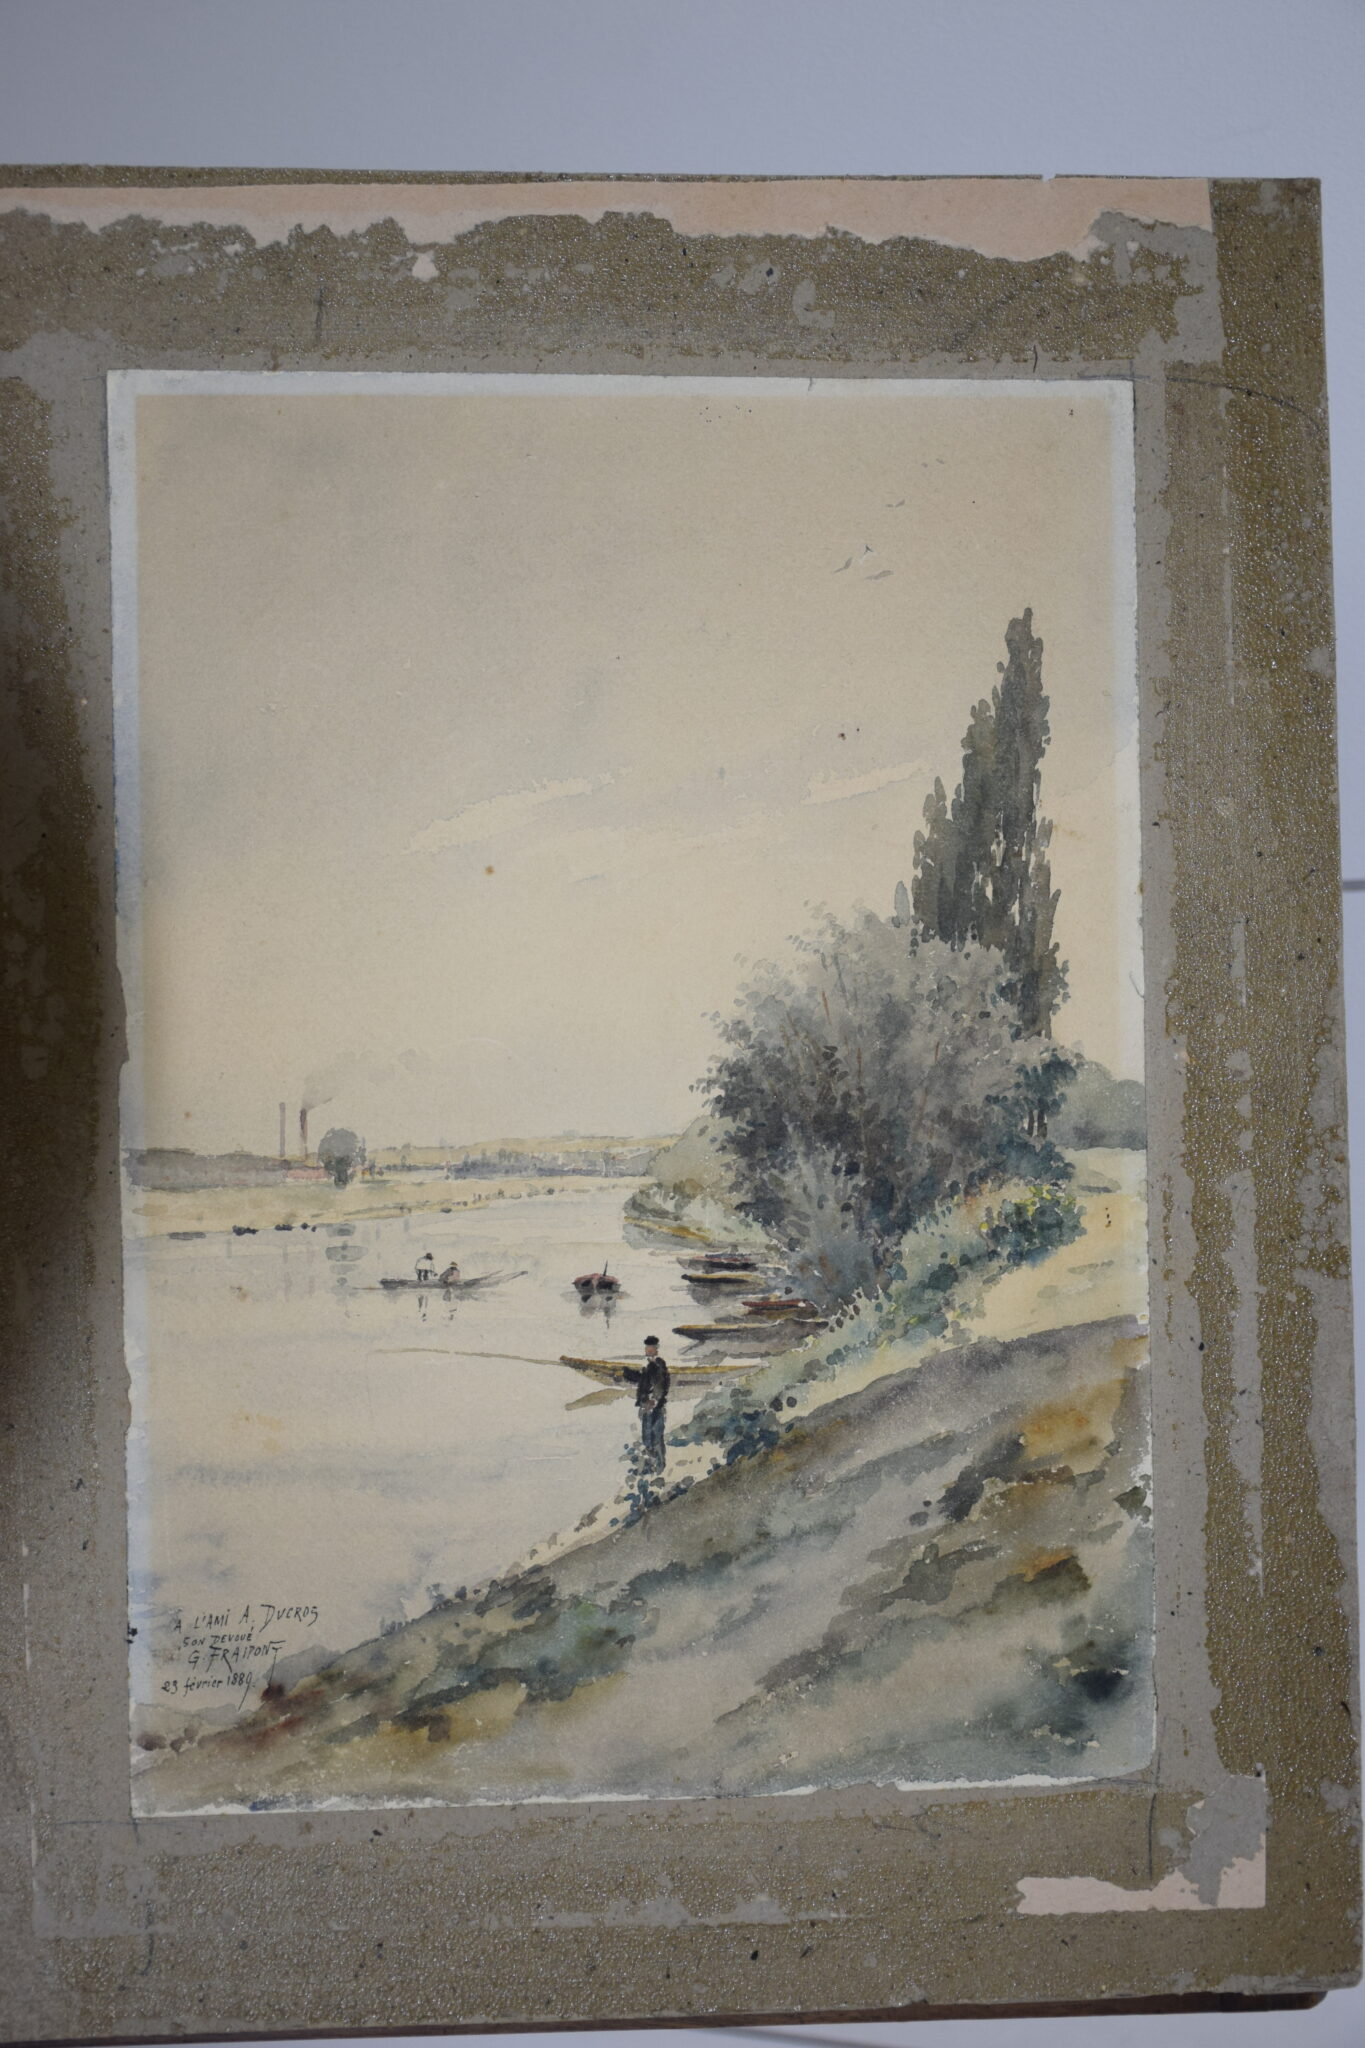 A l'ami Ducros_1889